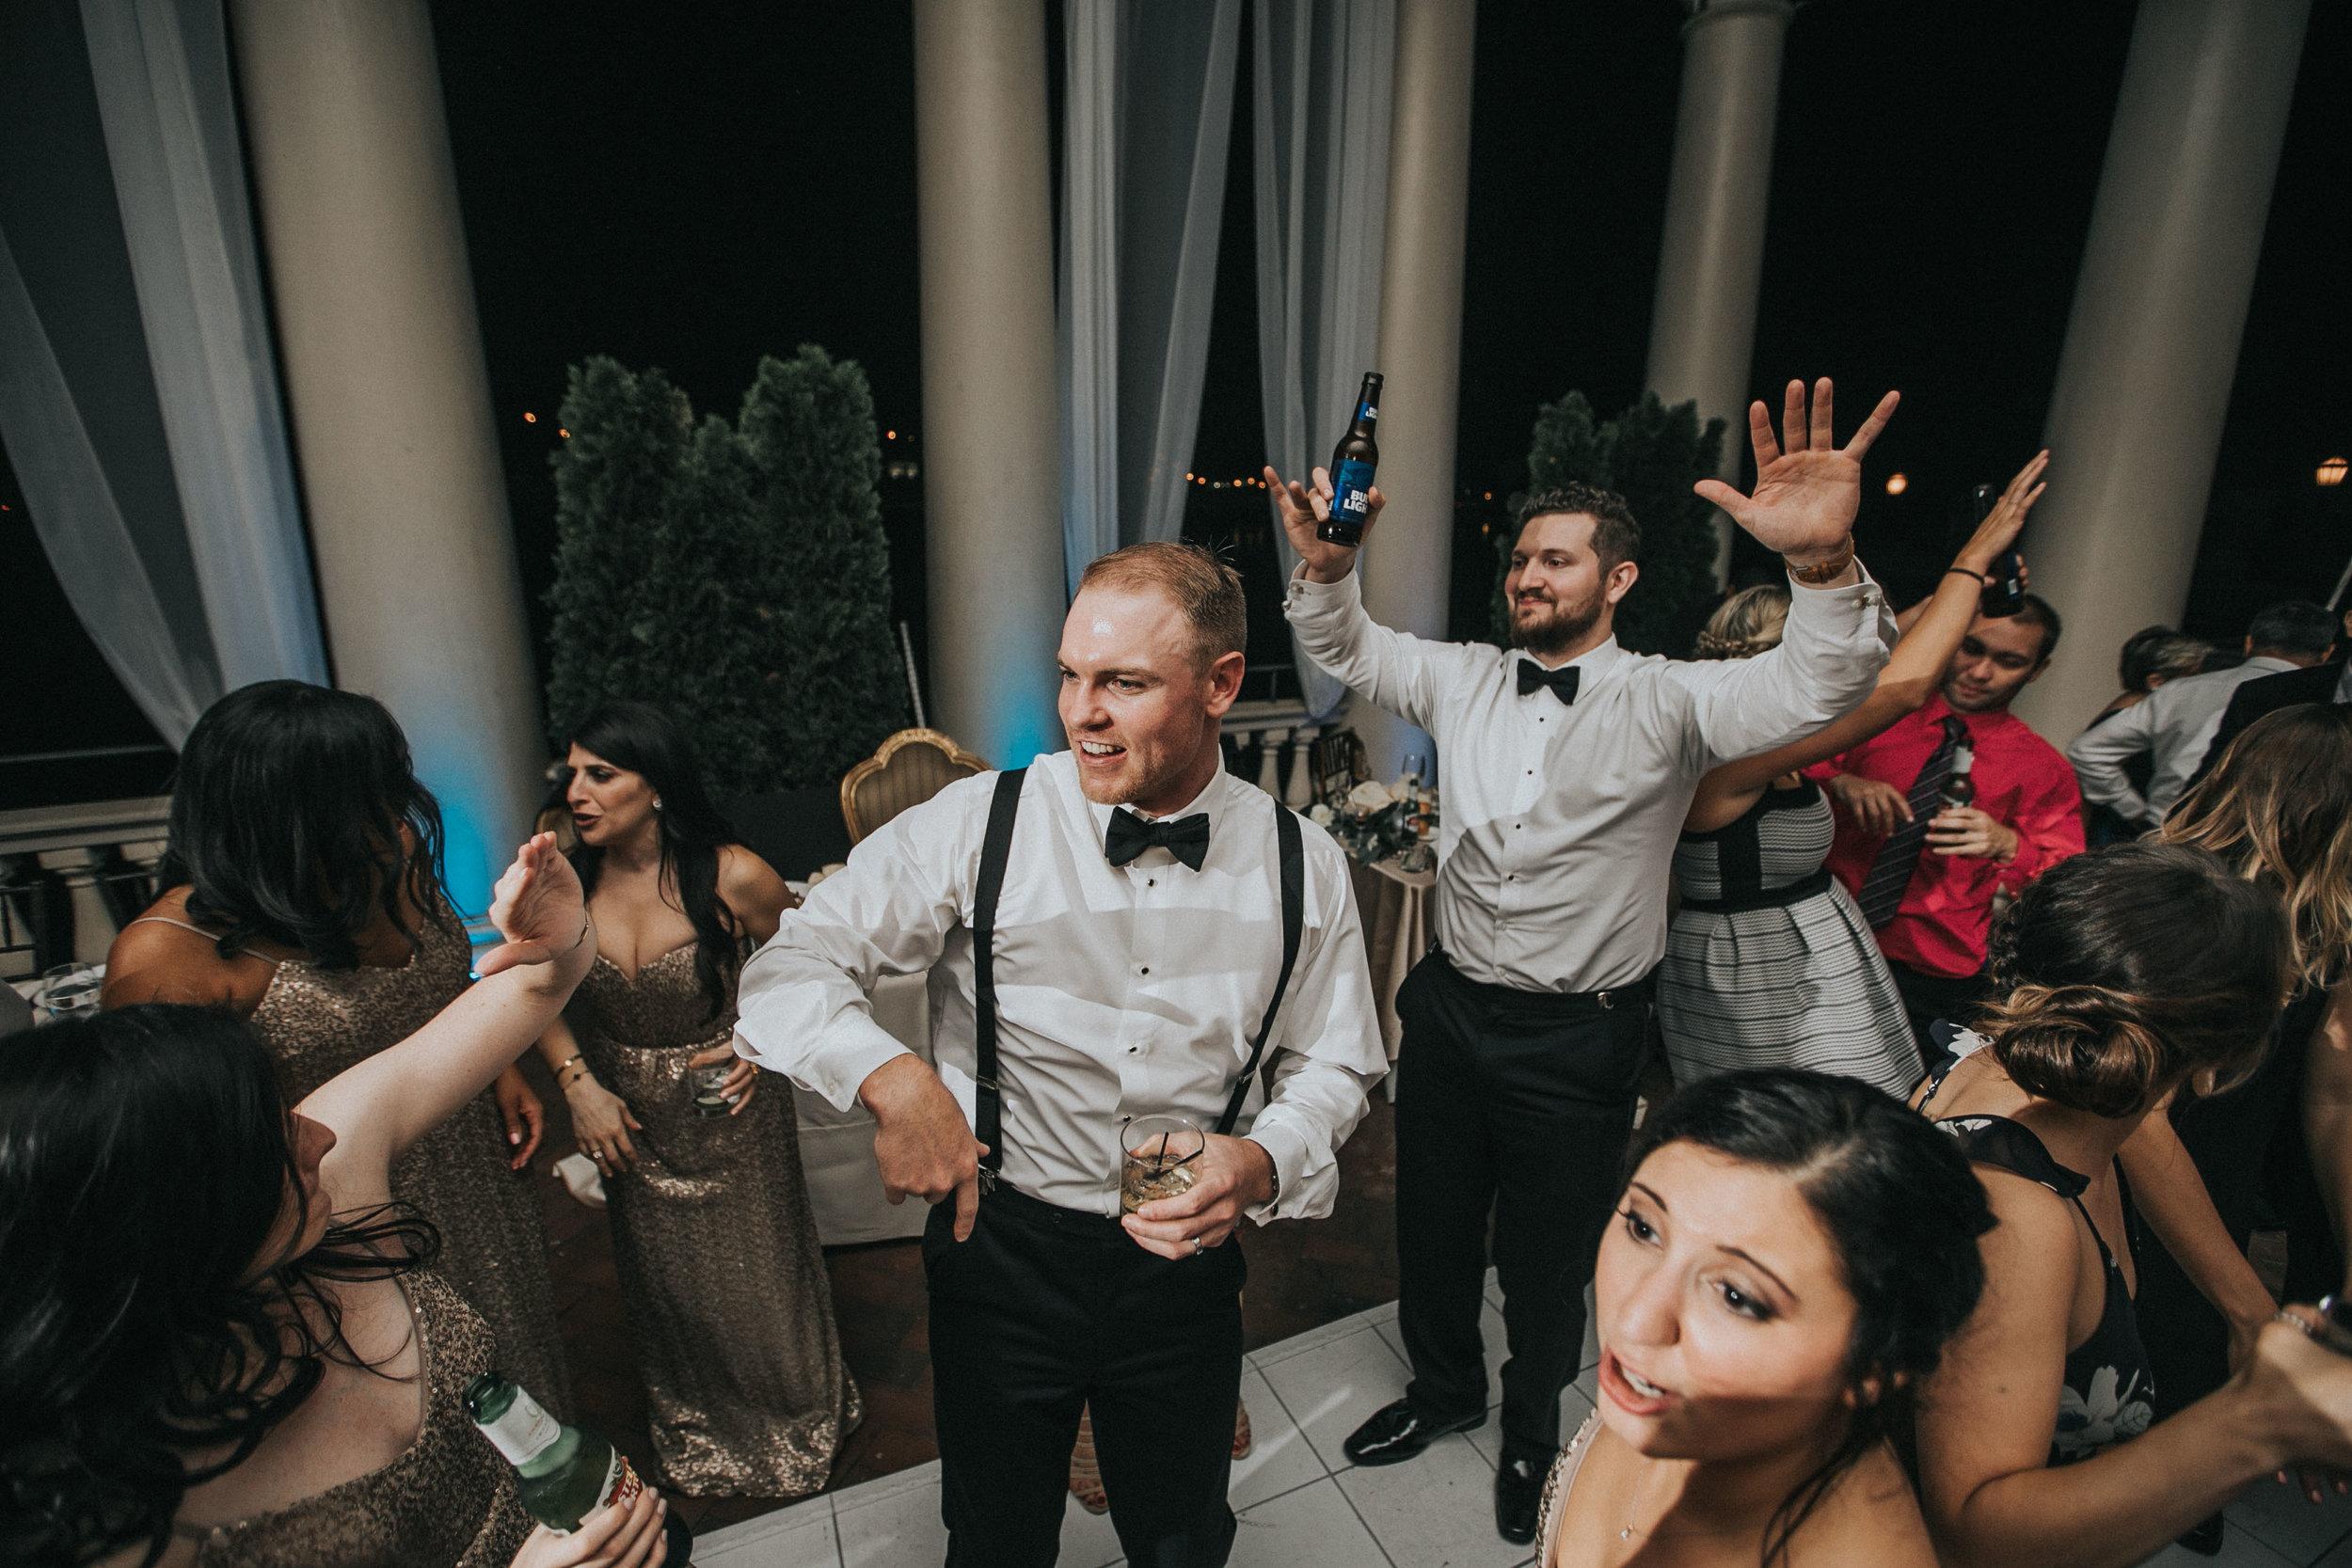 NewJersey_Wedding_Photography_Philadelphia__cescaphe_Waterworks_Reception-229.jpg